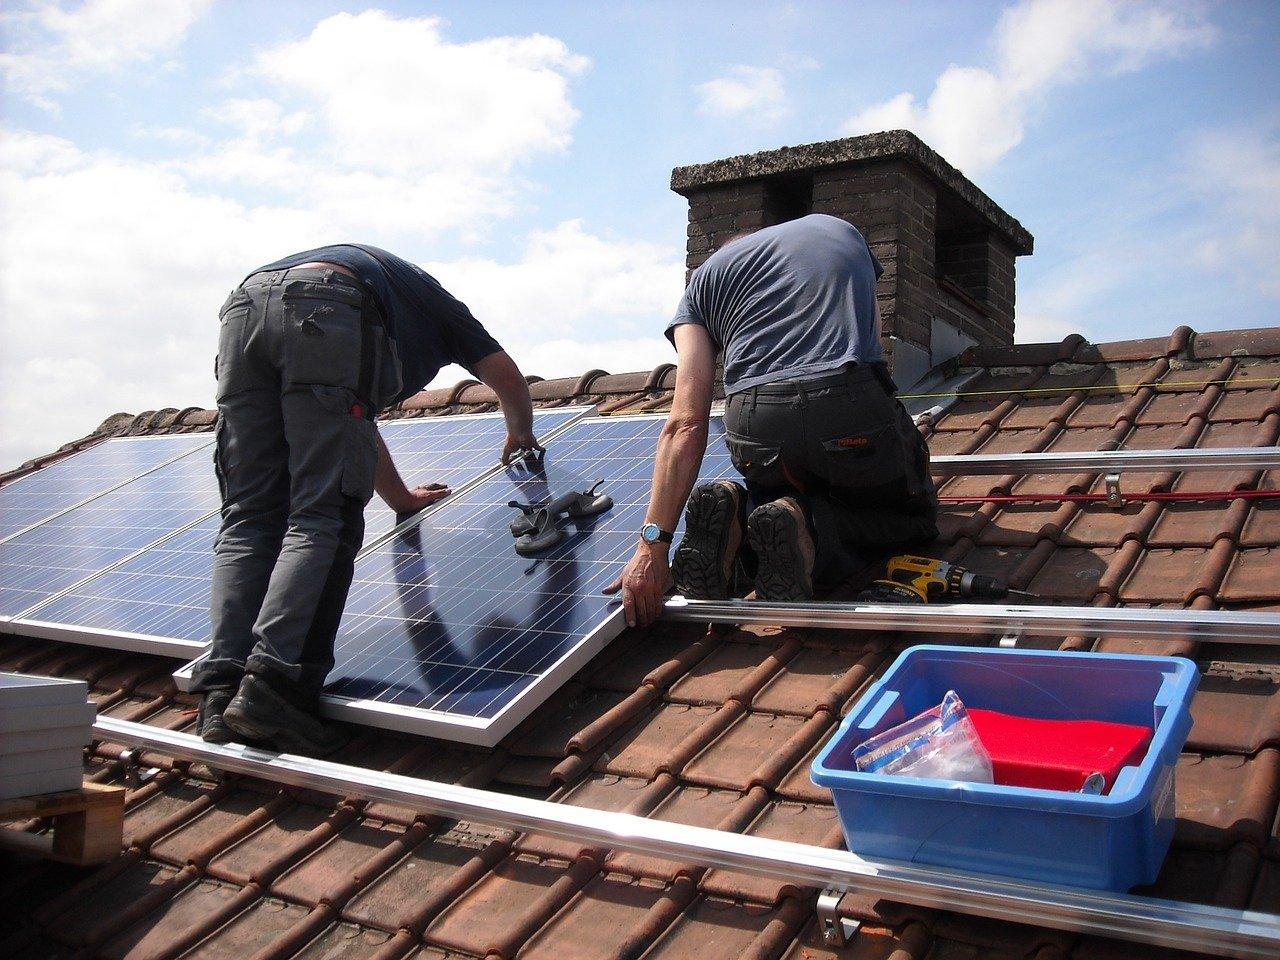 Lavorare nelle energie rinnovabili